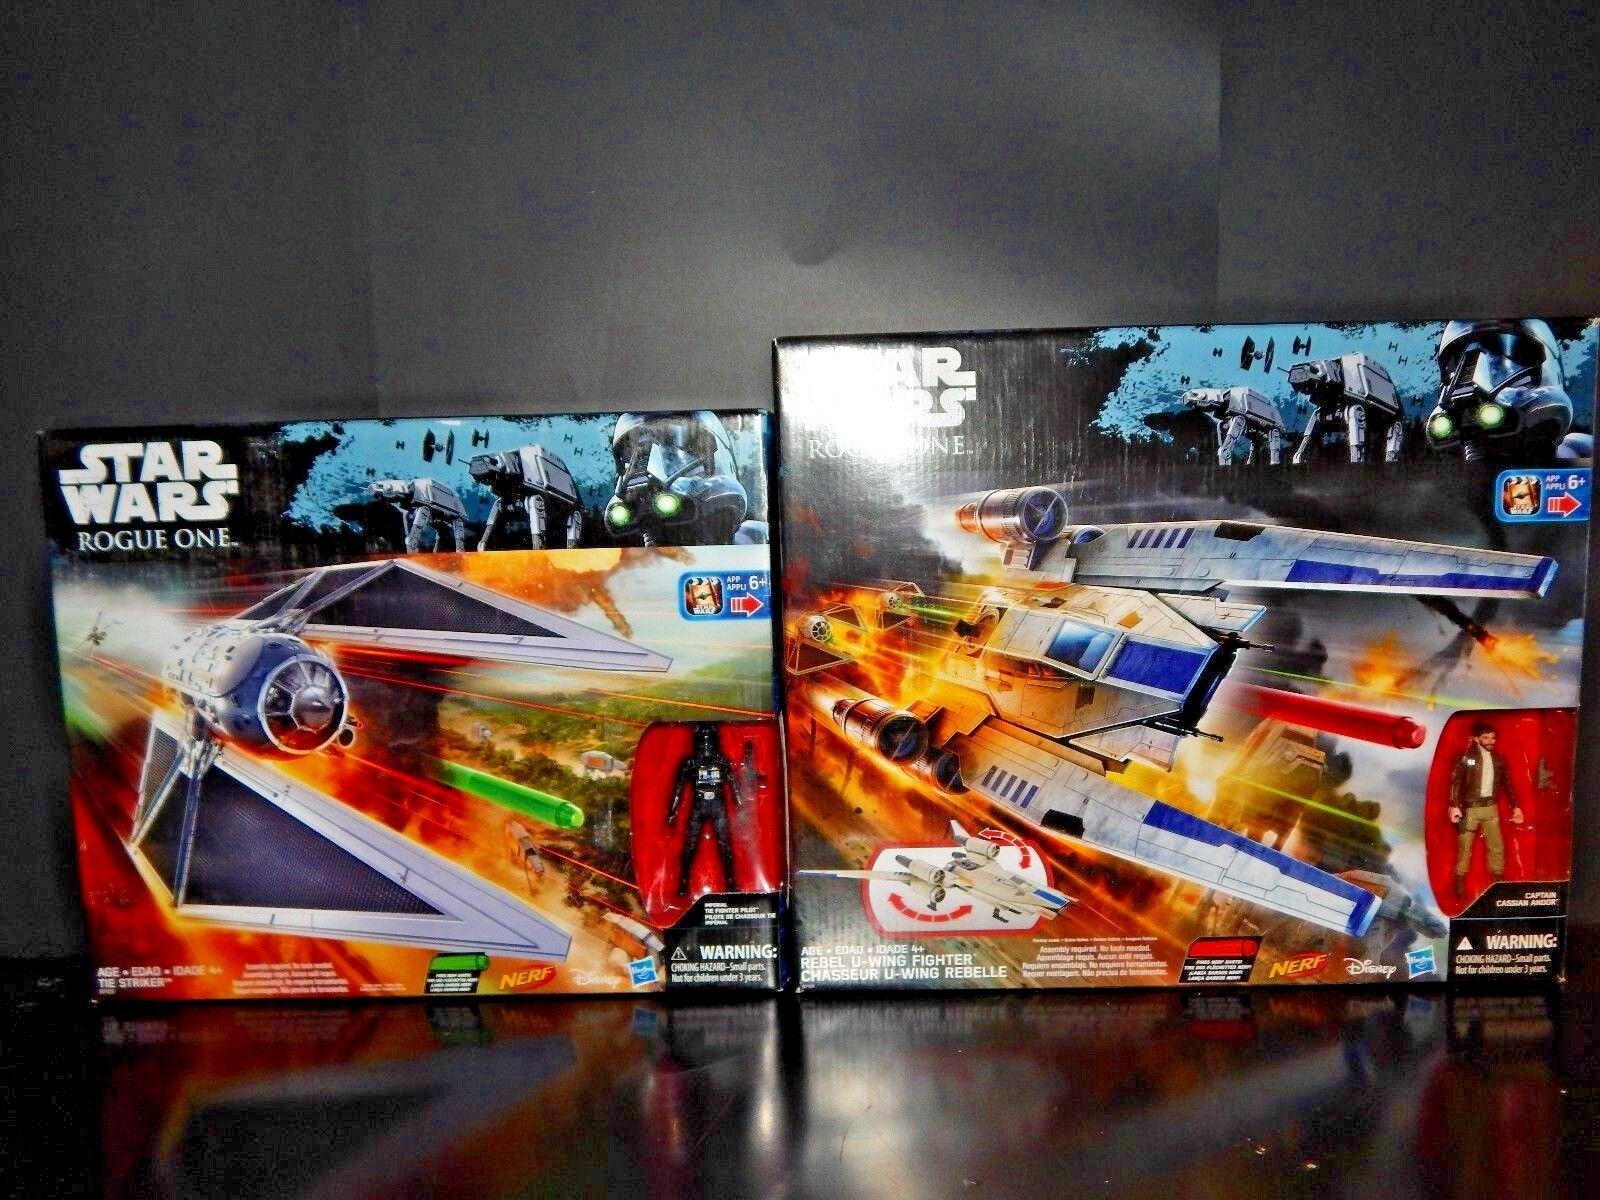 Star Wars Rogue one TIE Striker & U Wing Fighter Sealed